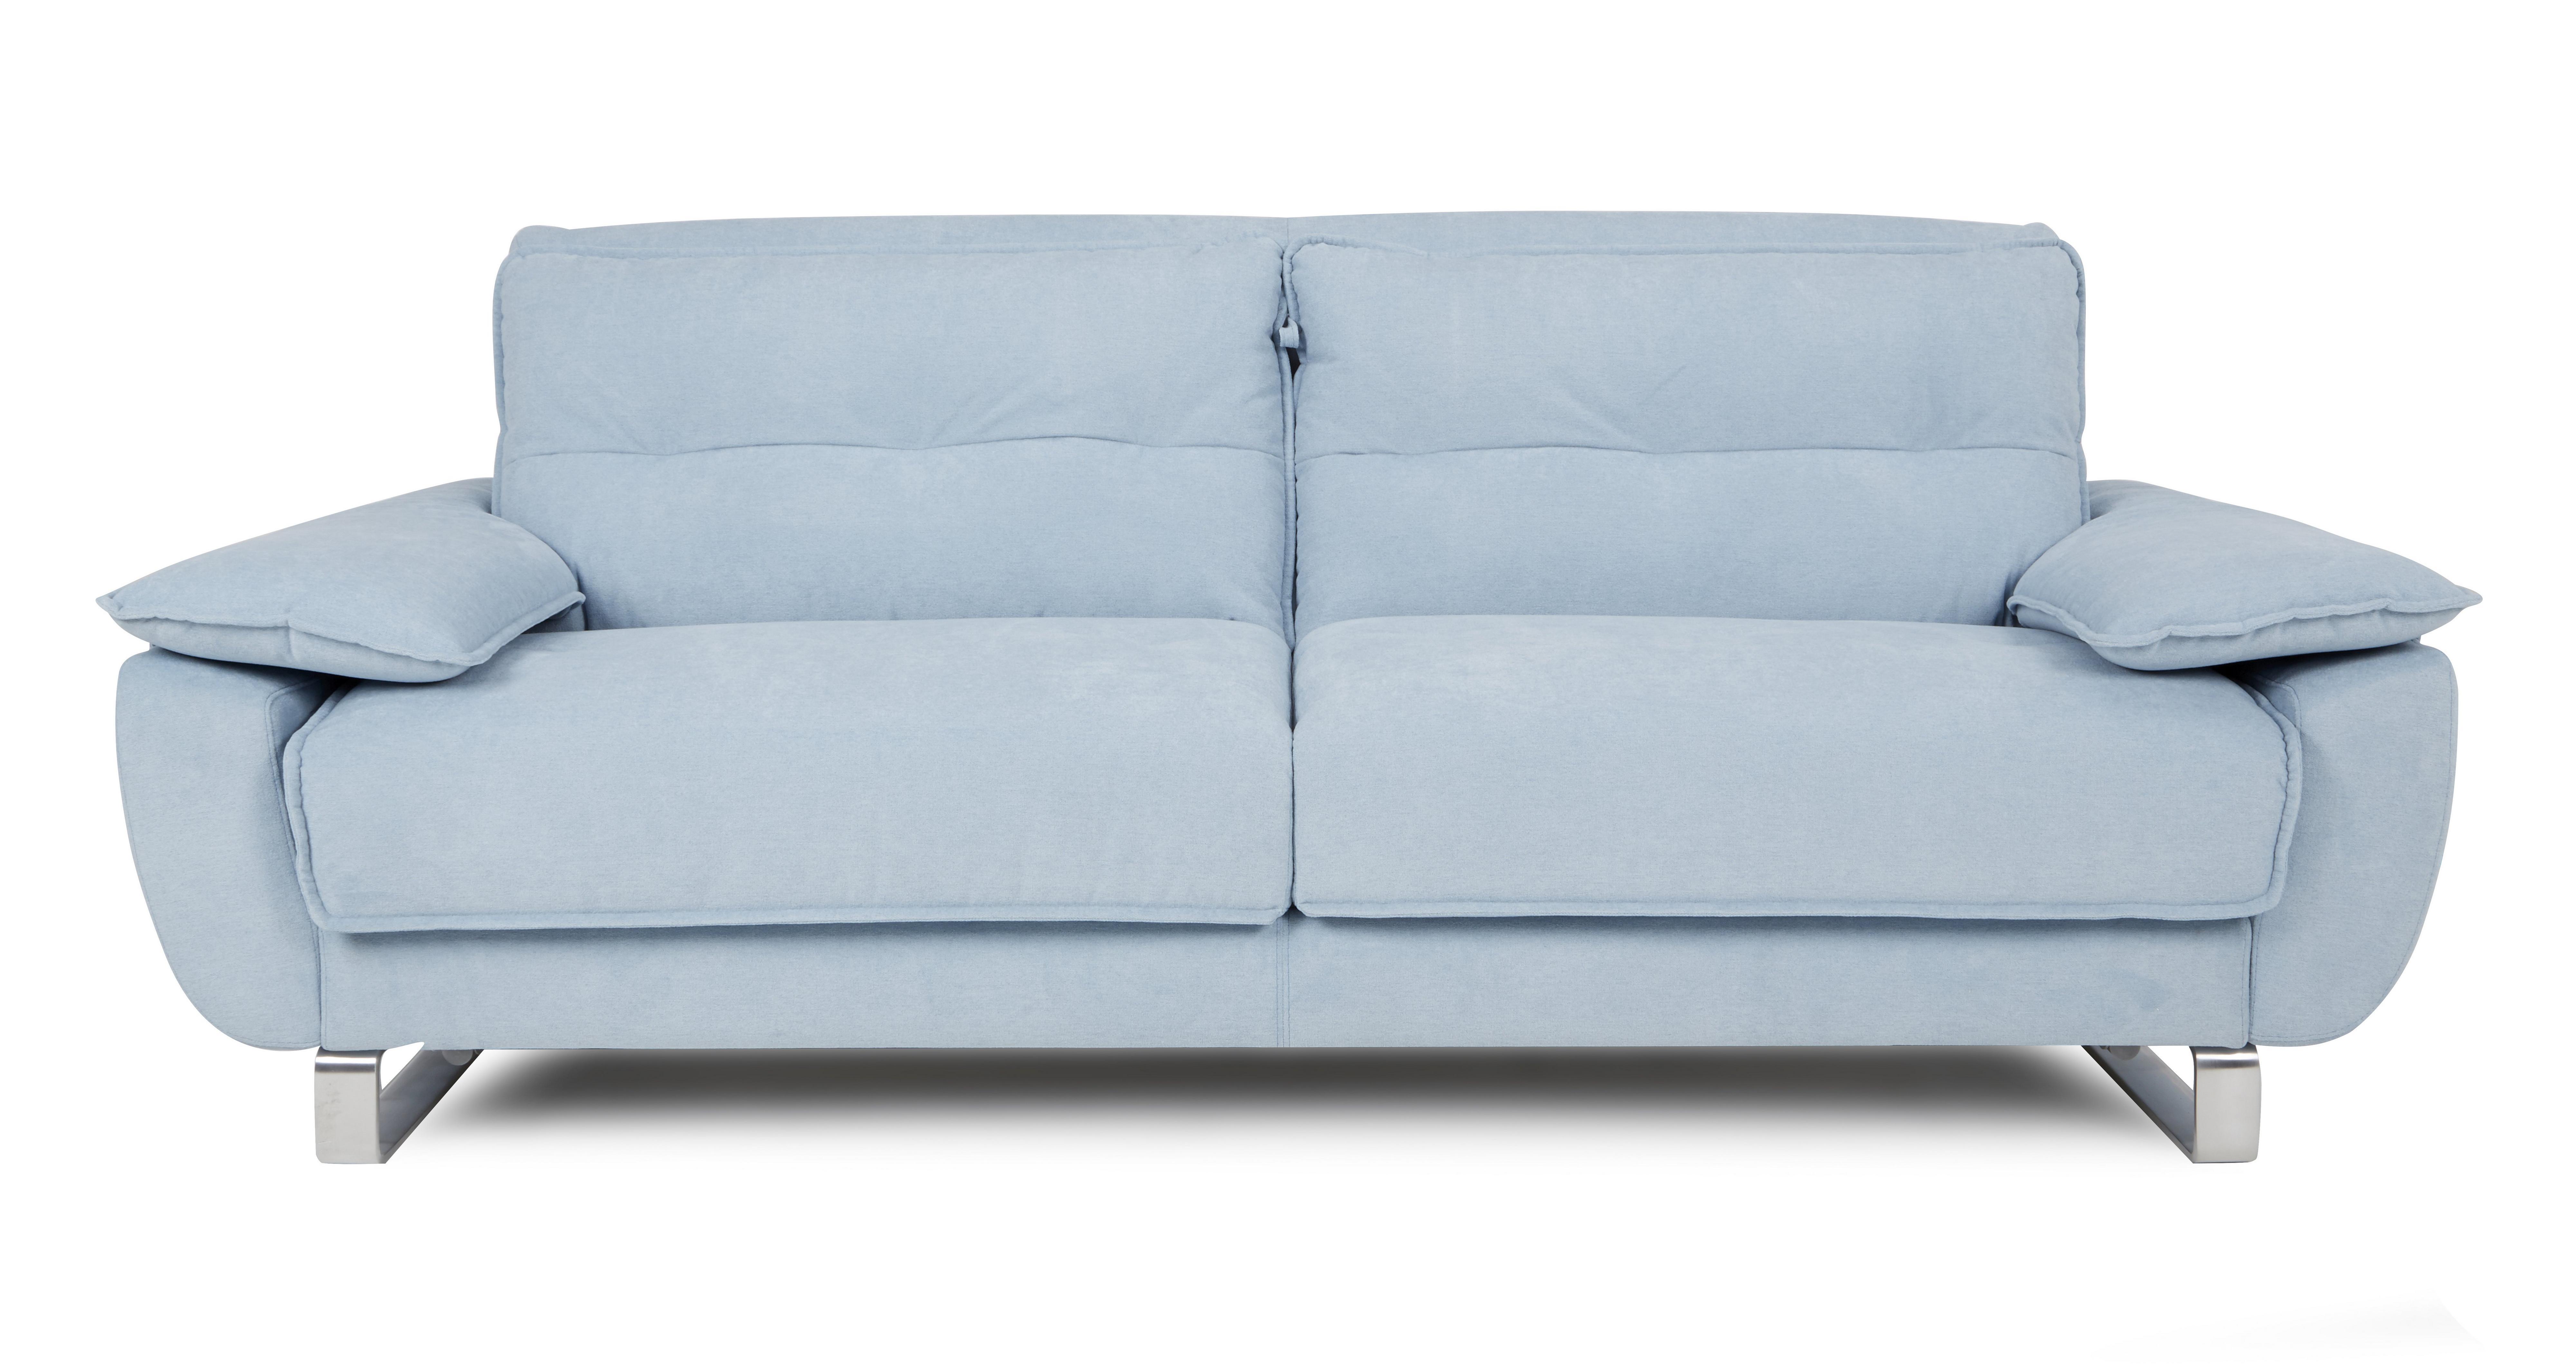 Fling 4 Seater Sofa Bed Tiana